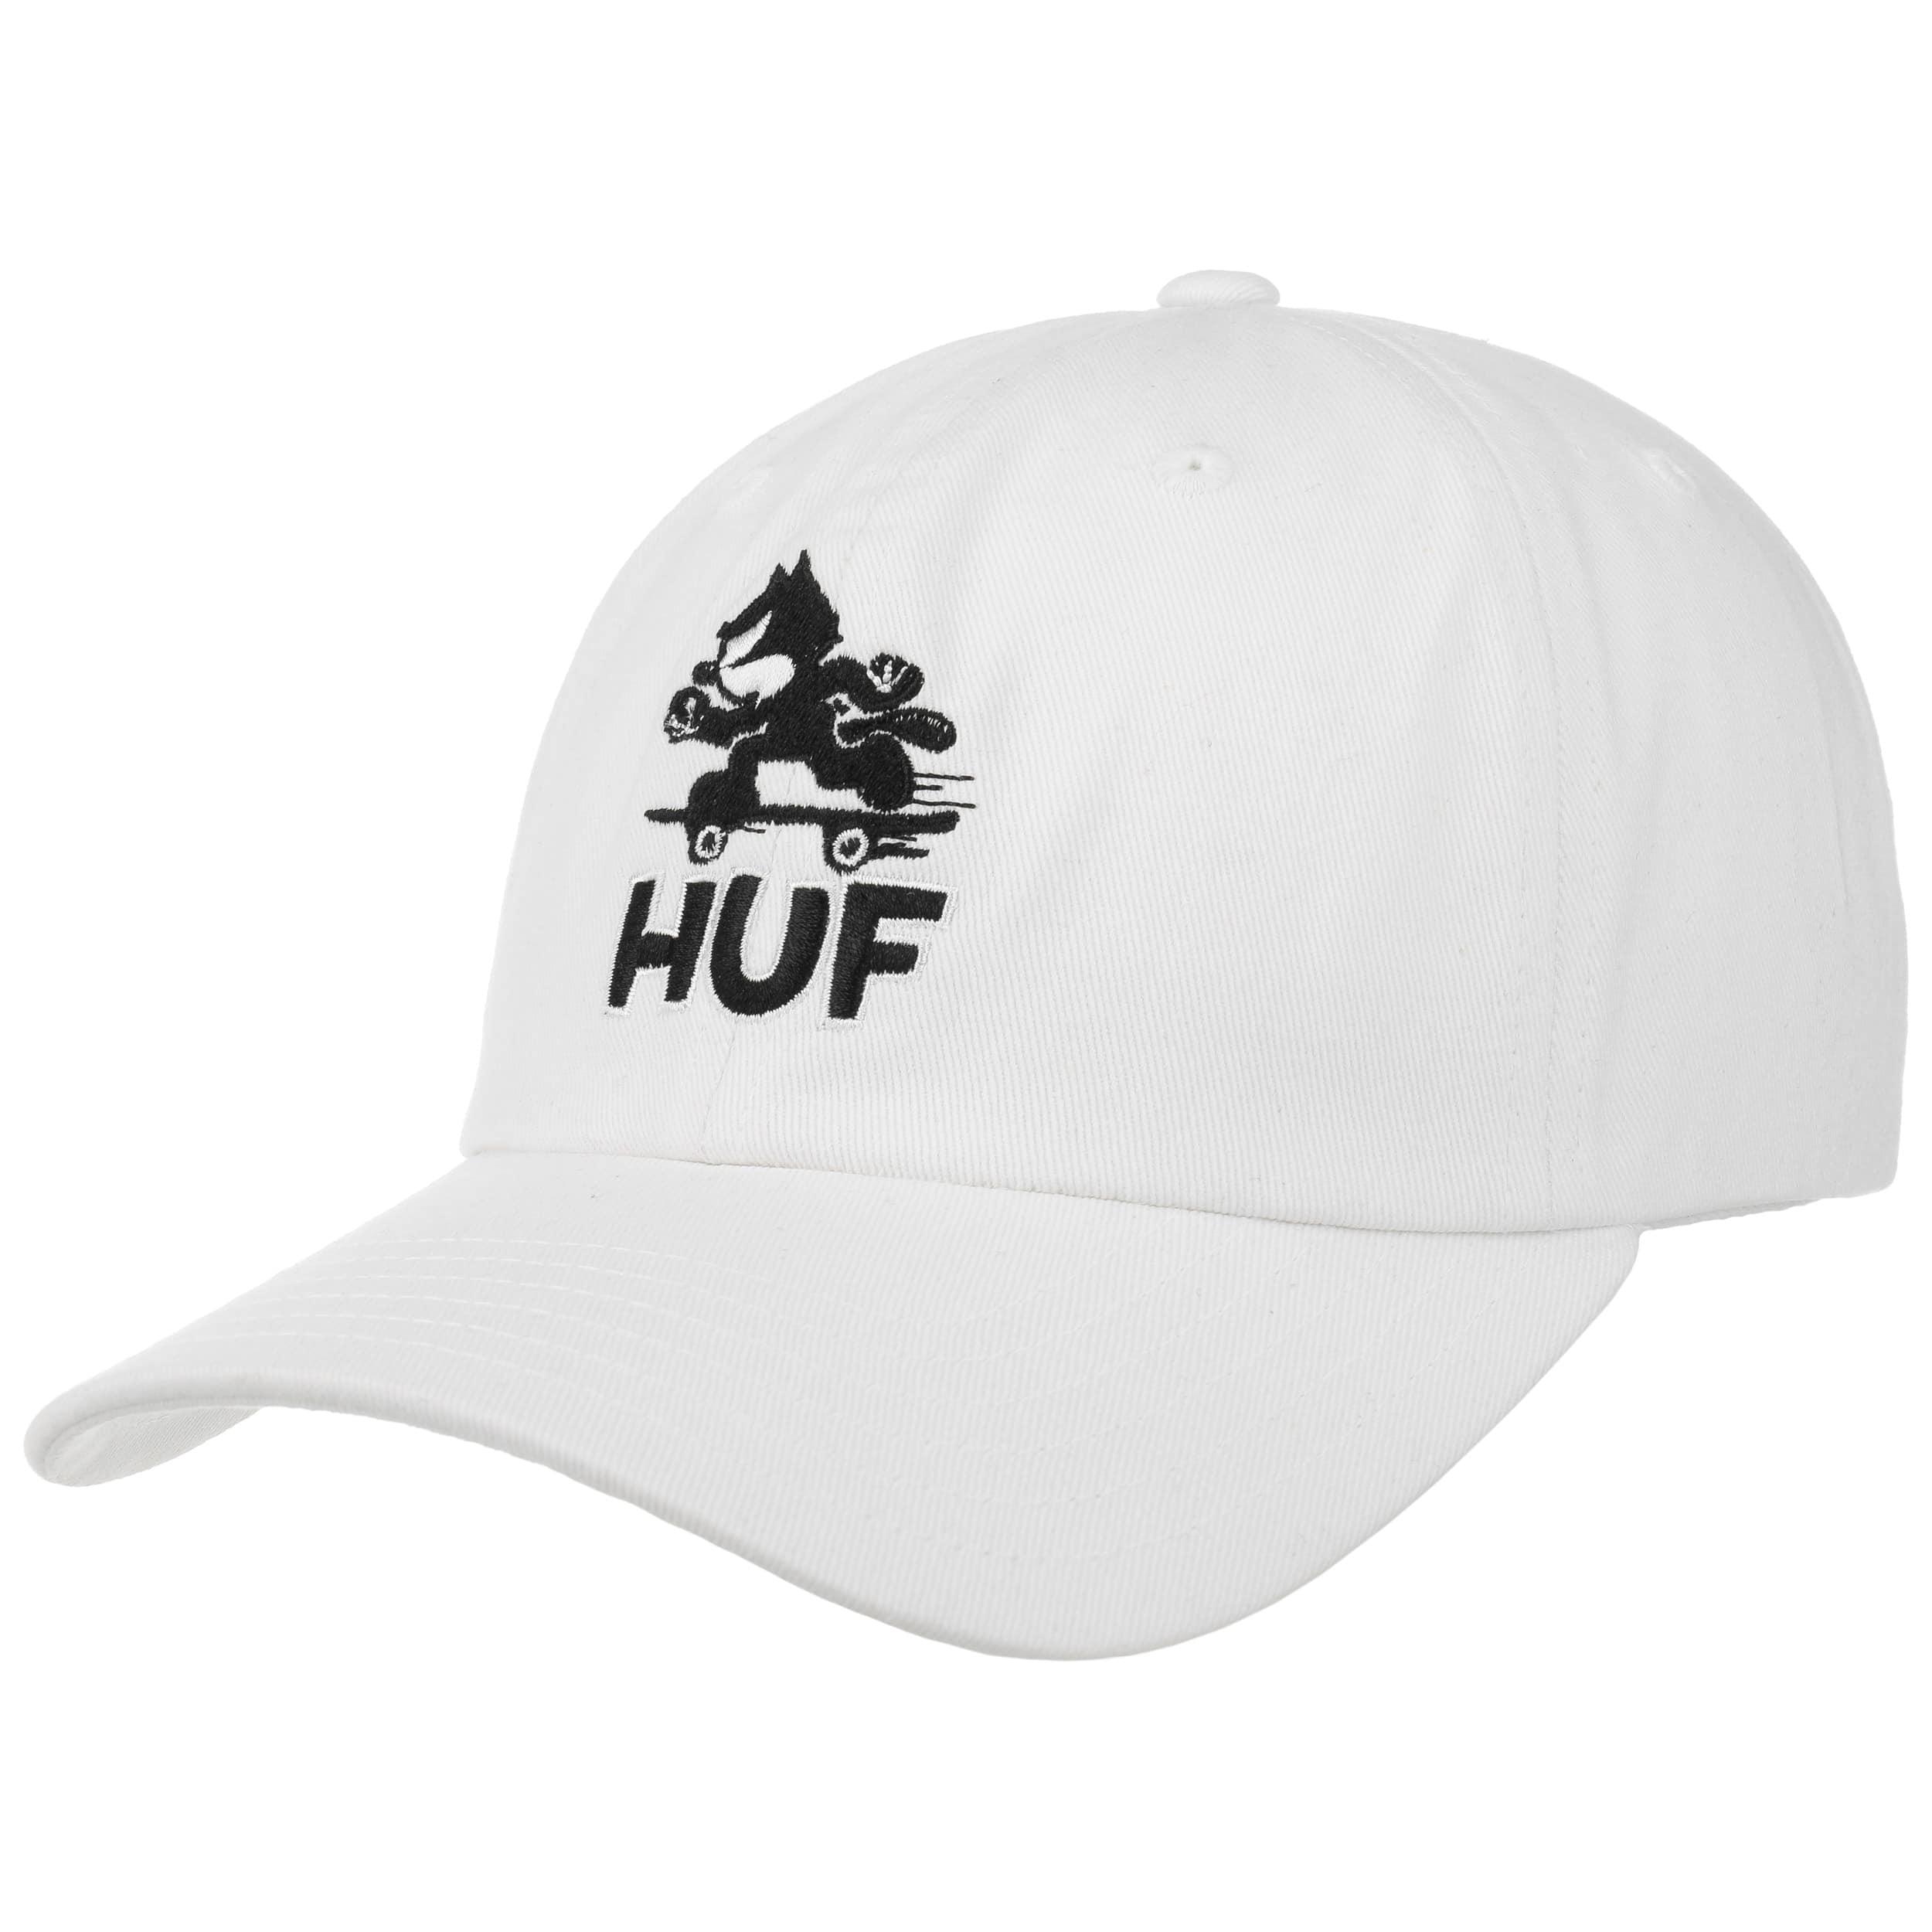 3b8370e67e1 Skate Felix Strapback Cap by HUF